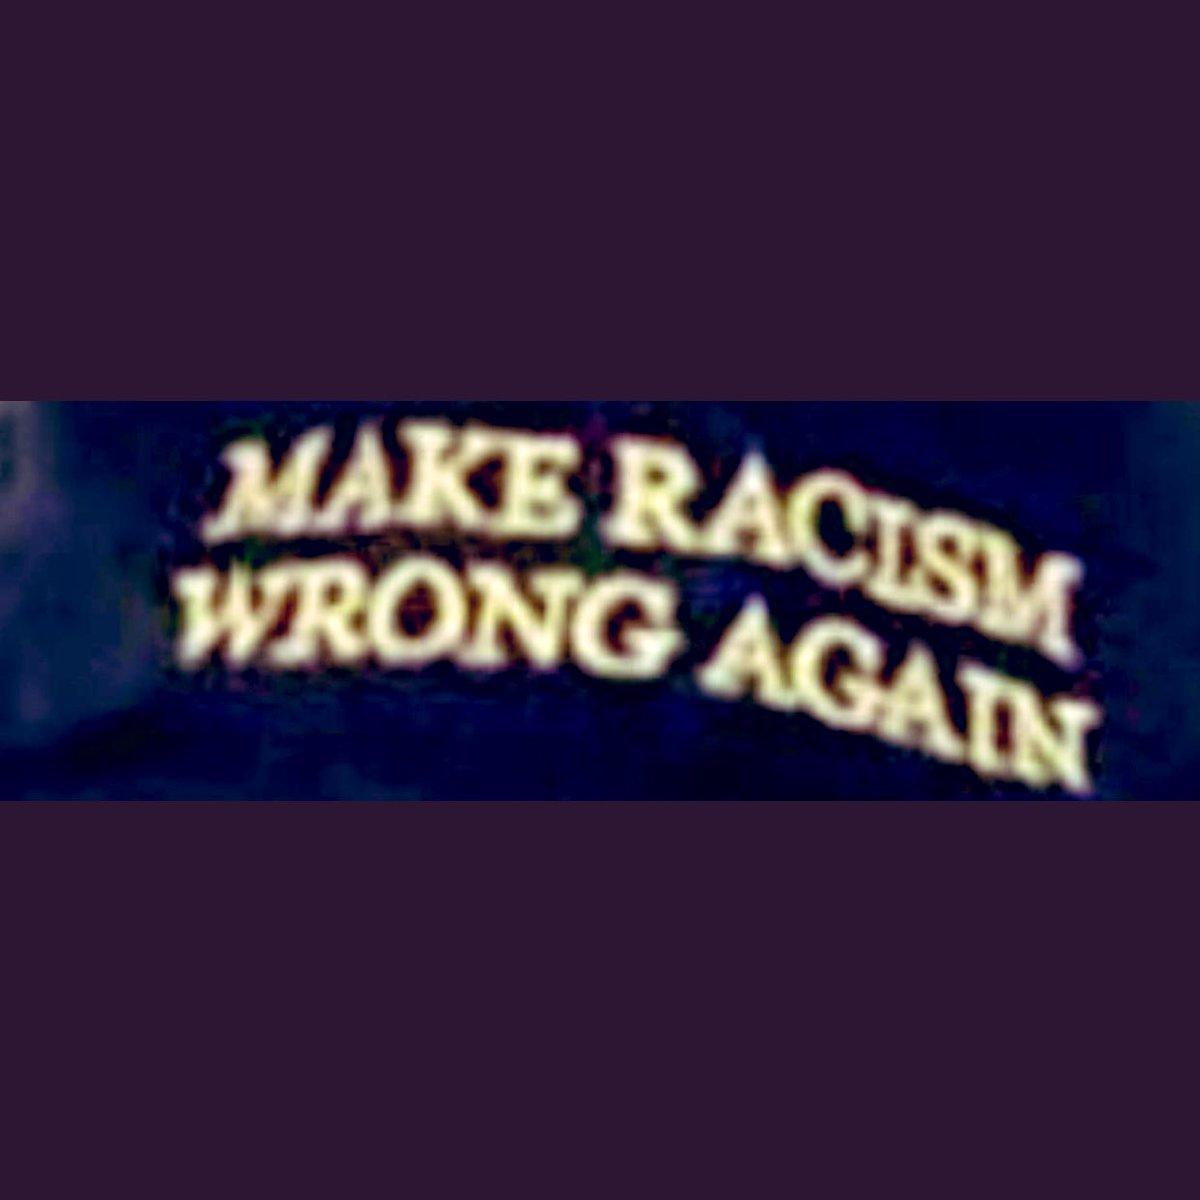 Instead of Make Whites Great Again, I choose Make Racism Wrong Again